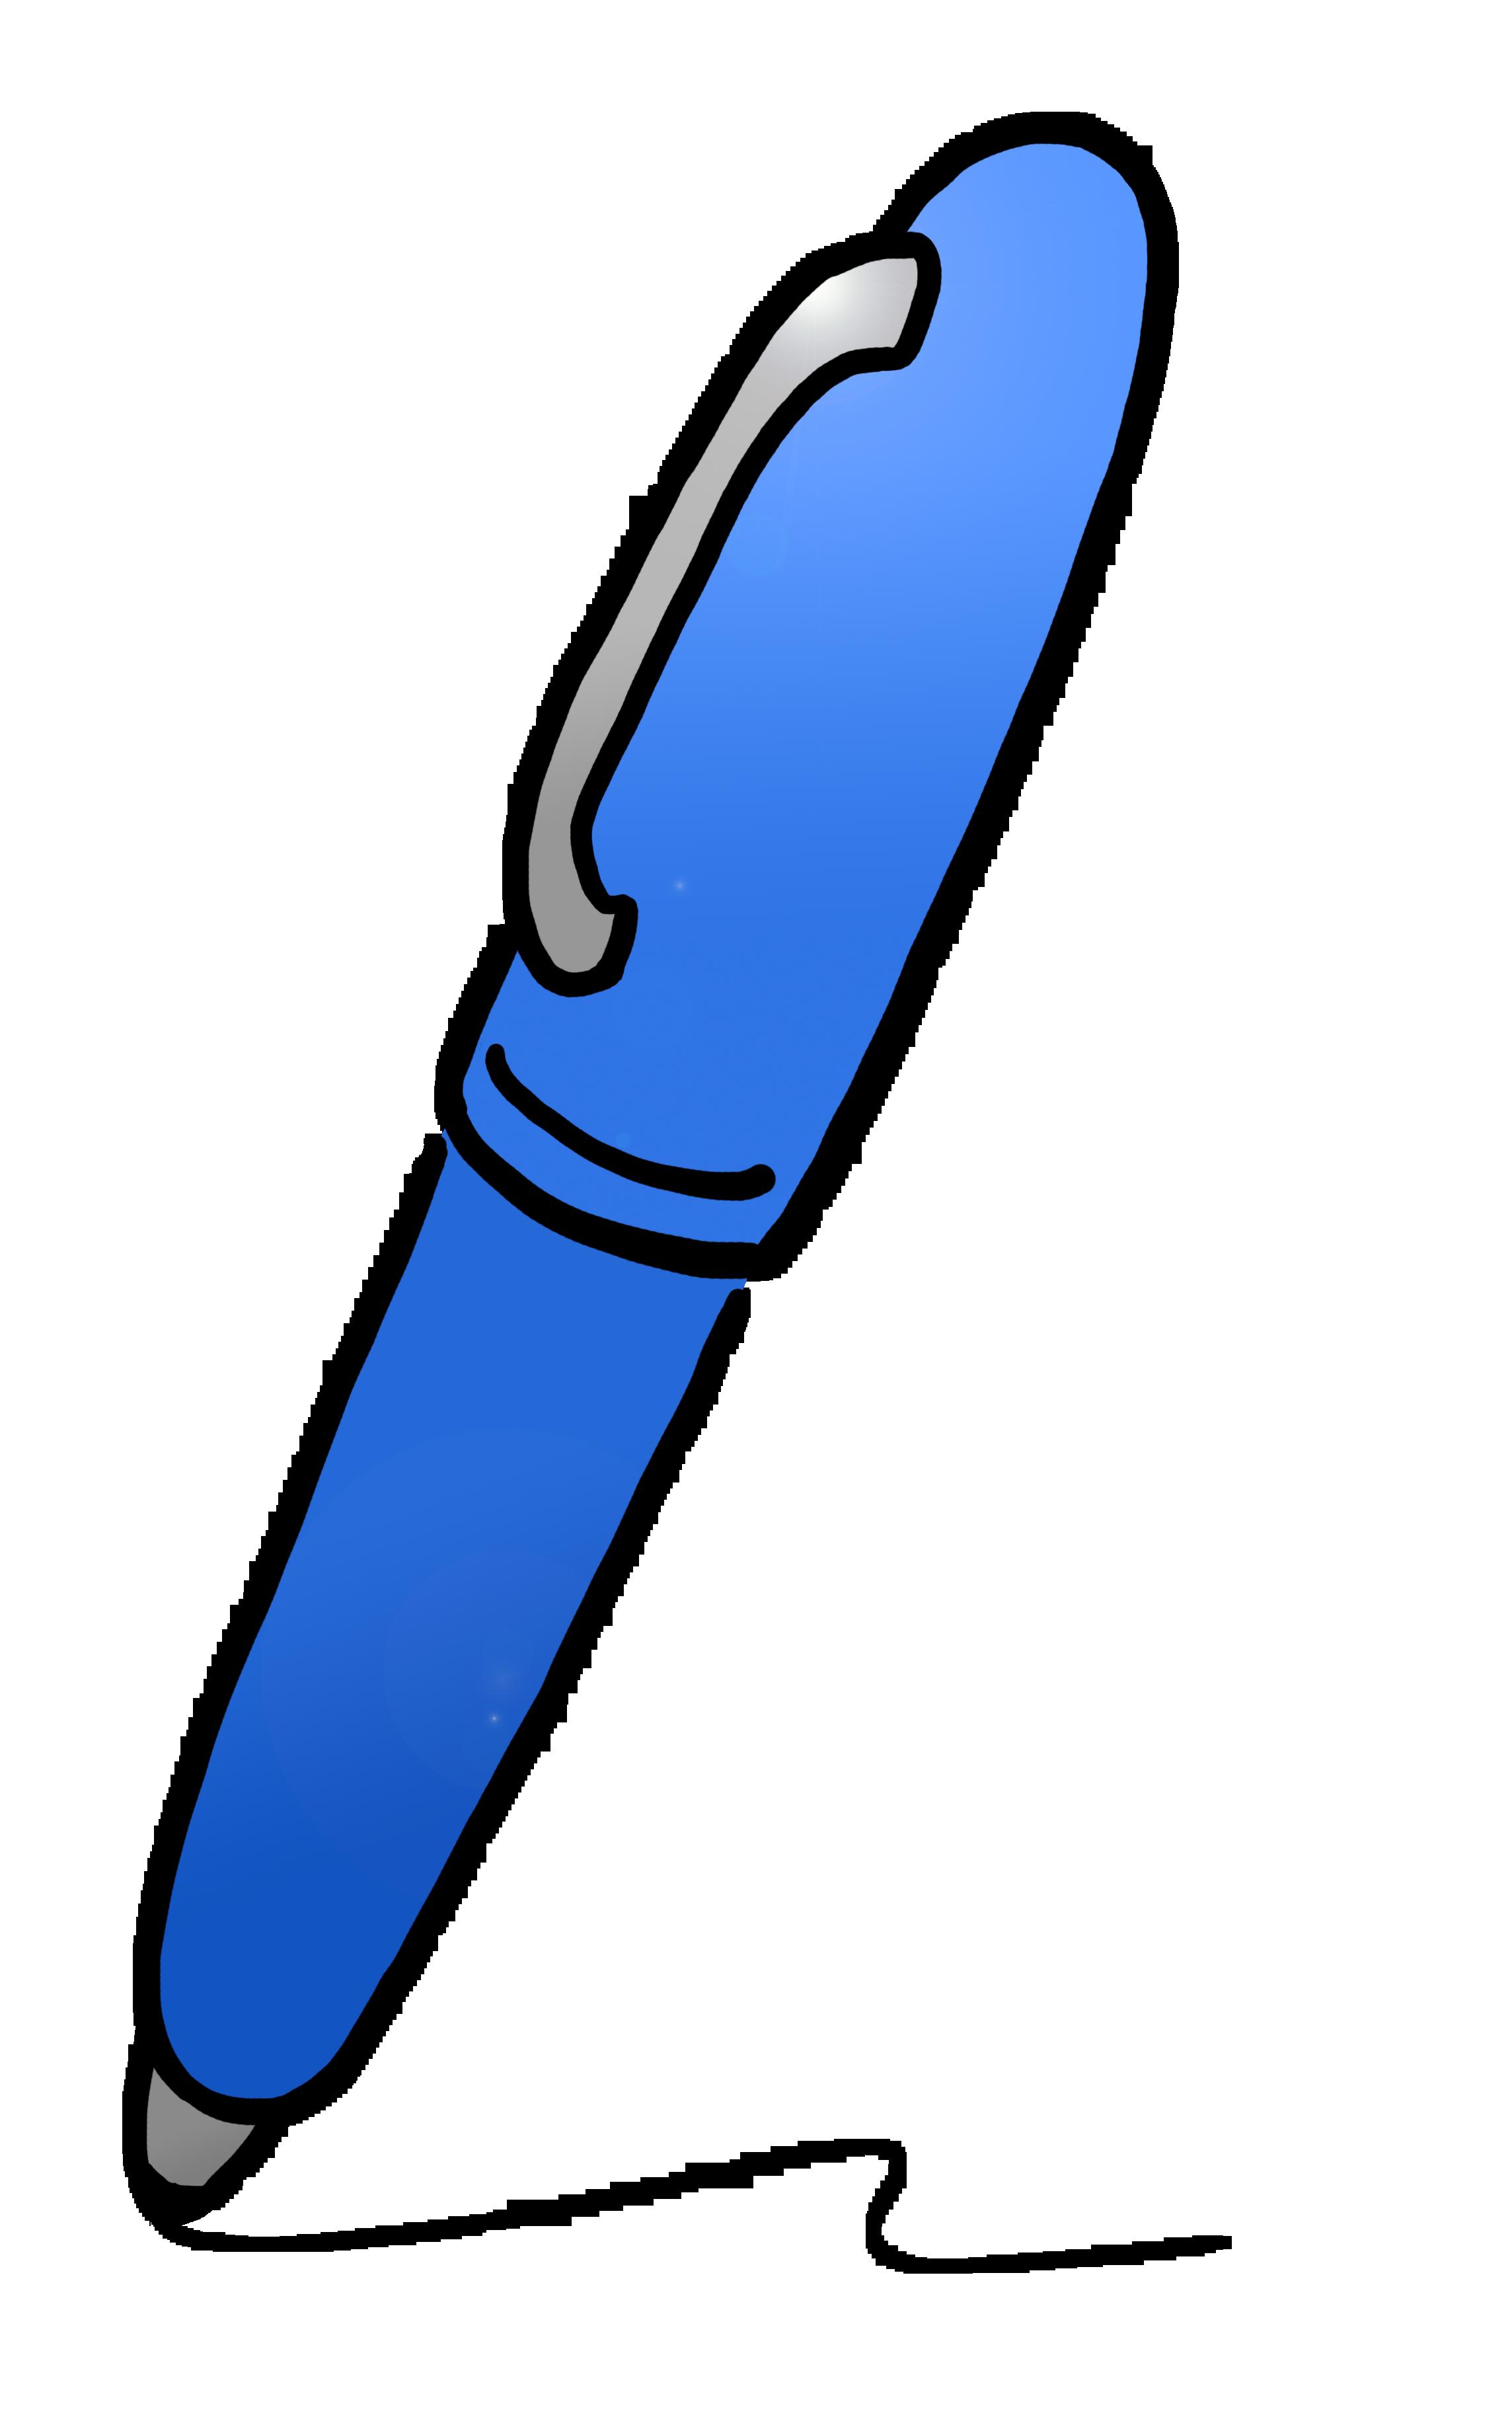 Pen clipart #4, Download drawings